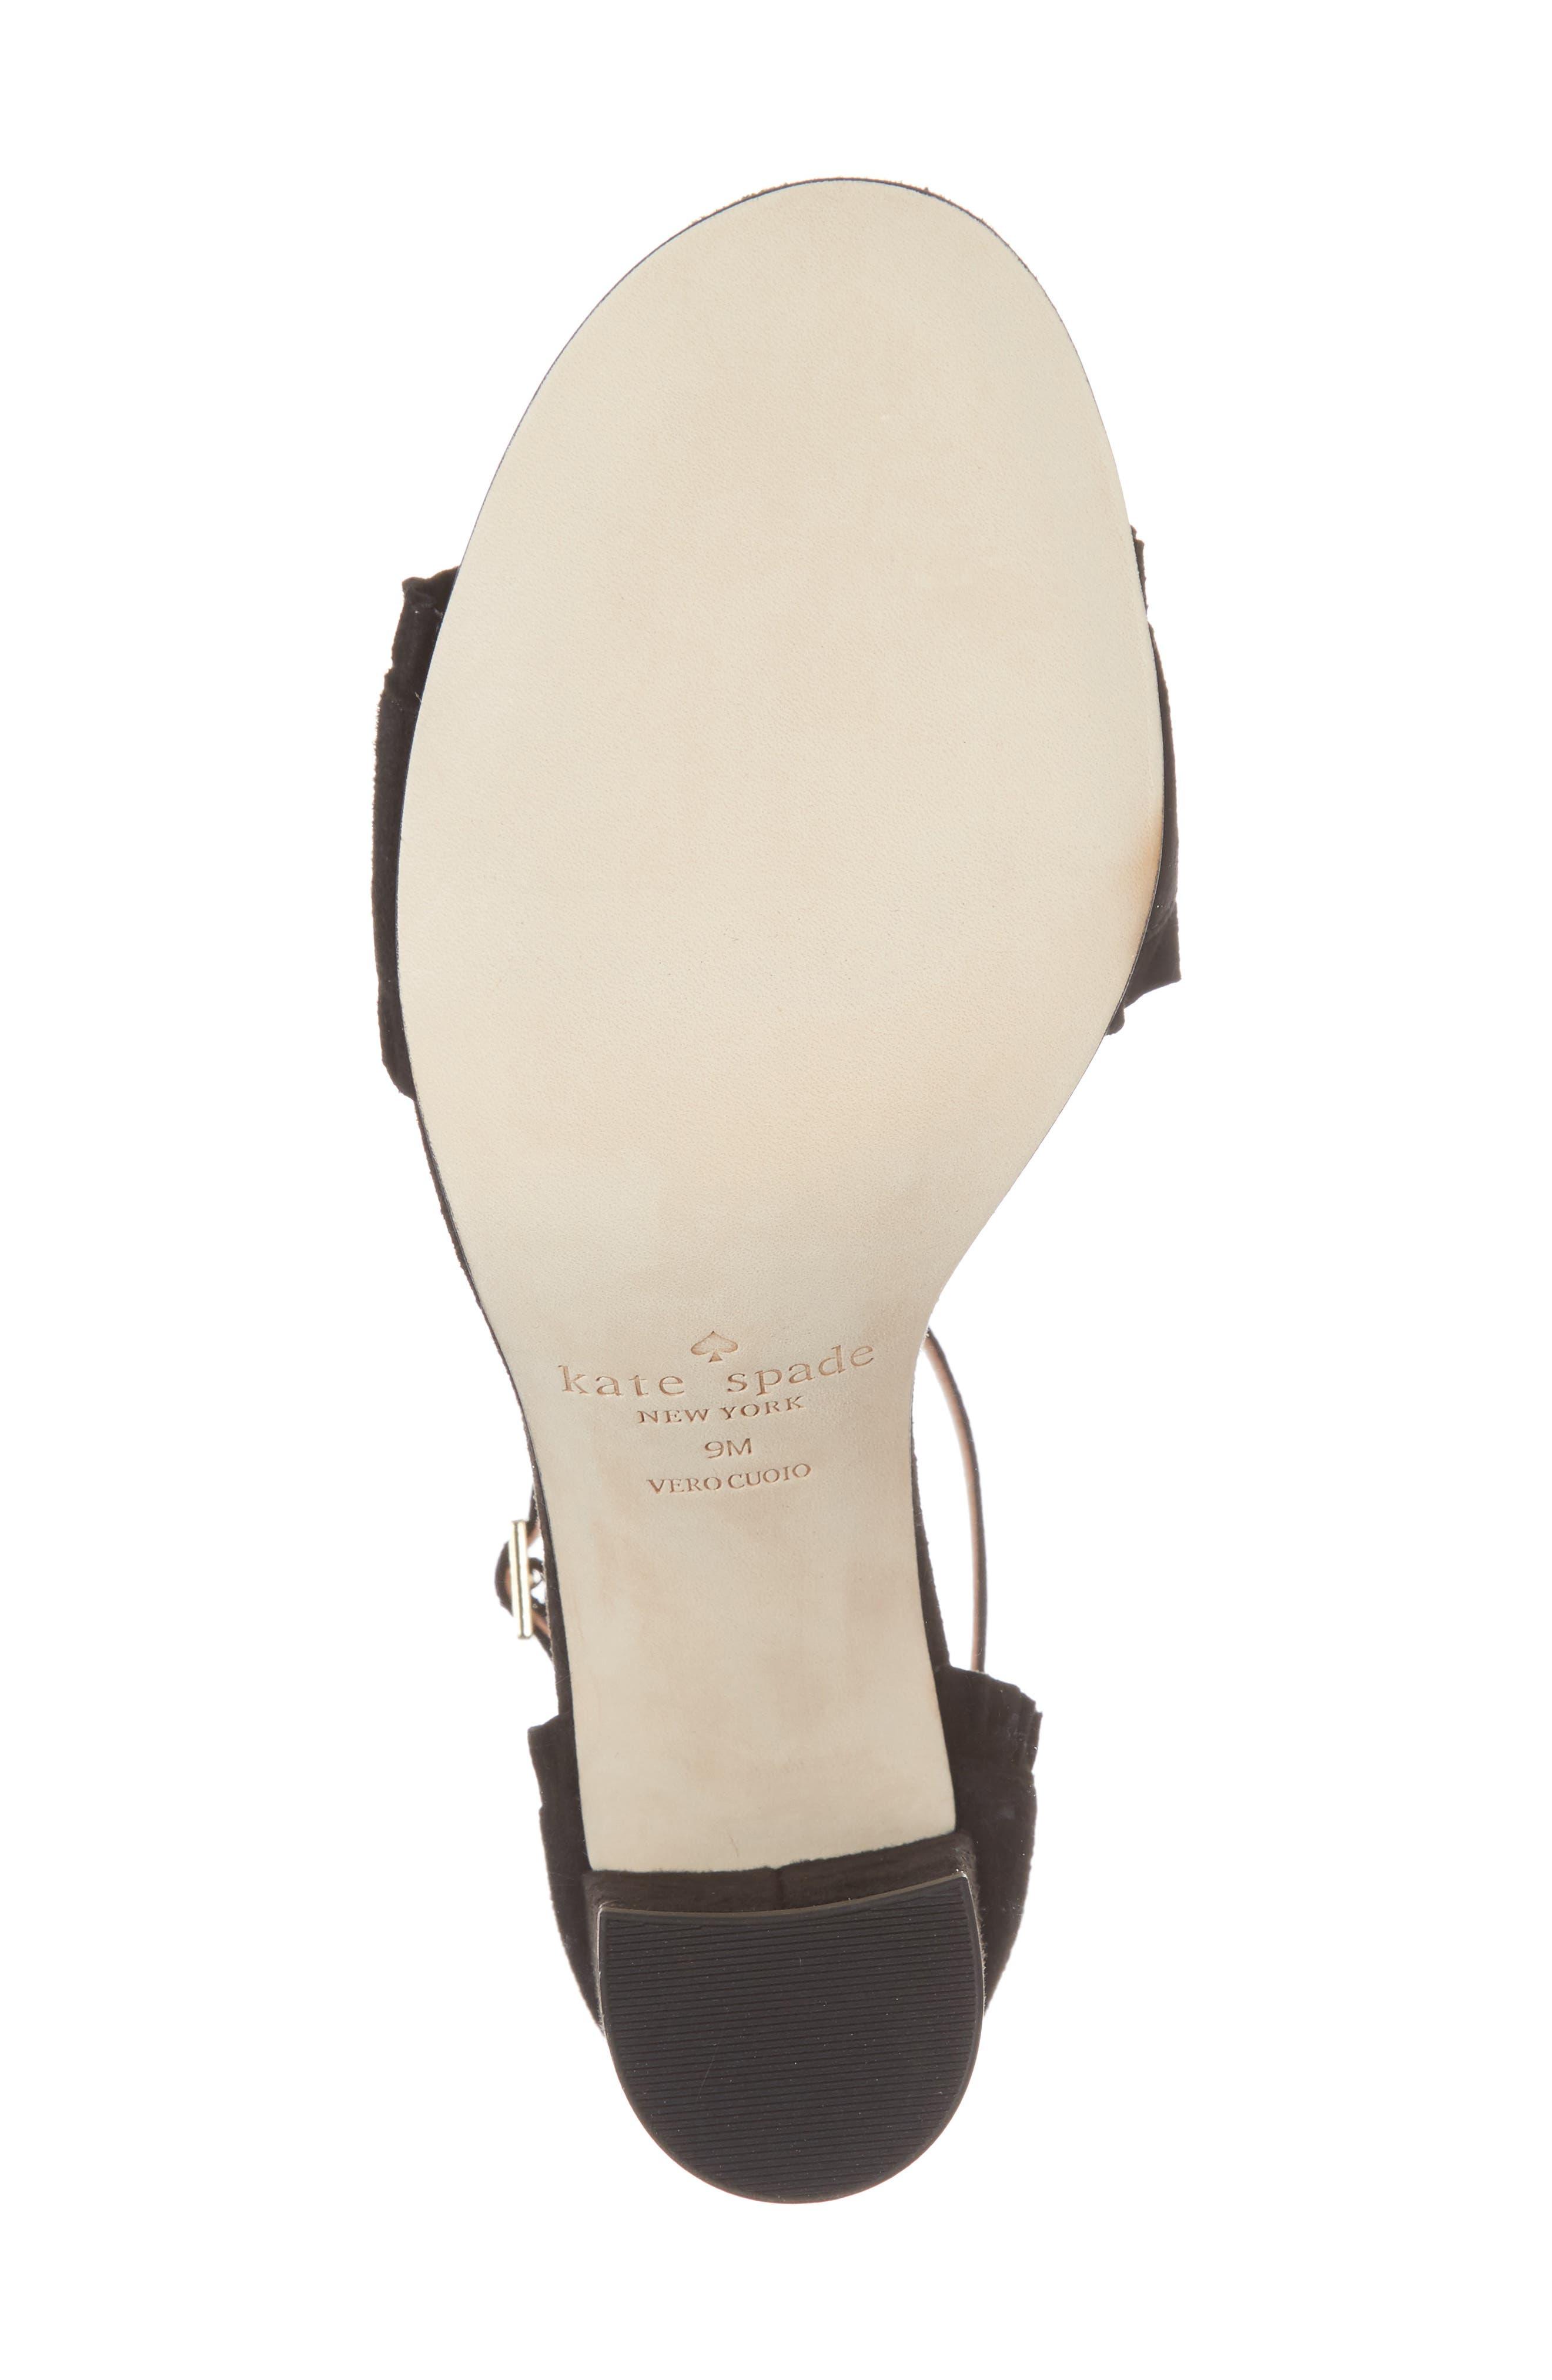 odele ruffle sandal,                             Alternate thumbnail 6, color,                             Black Suede